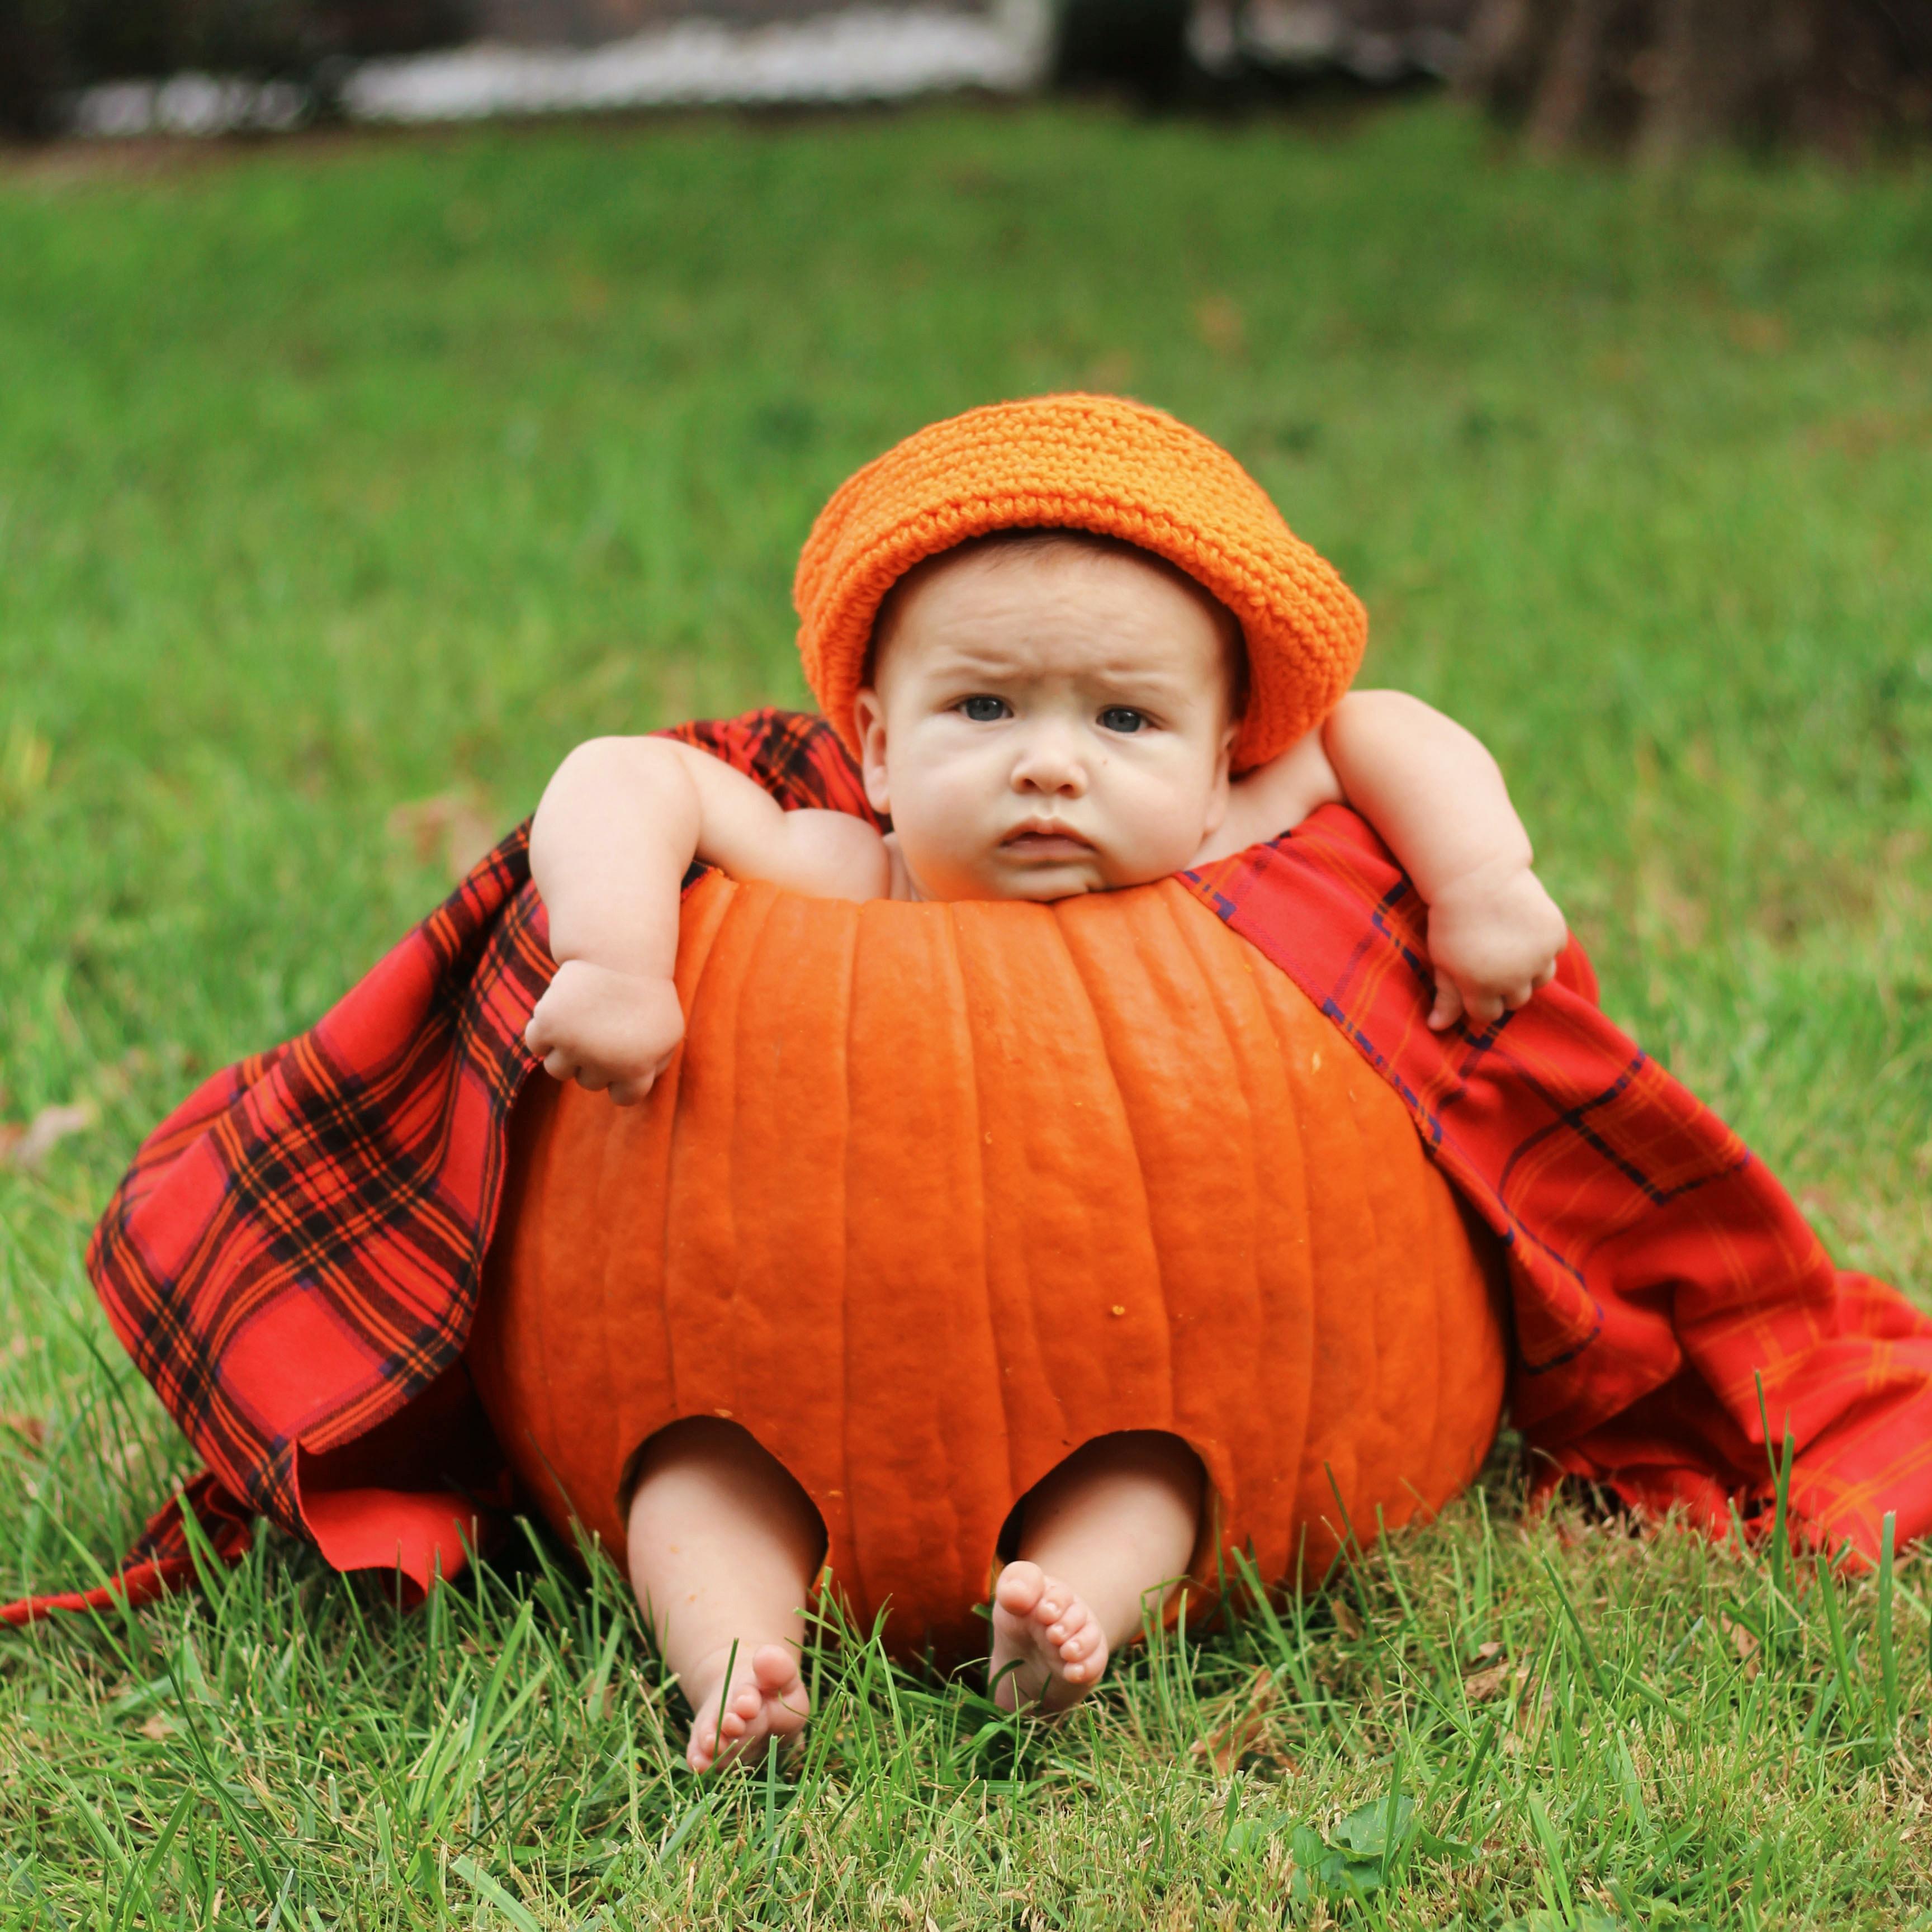 baby in red pumpkin